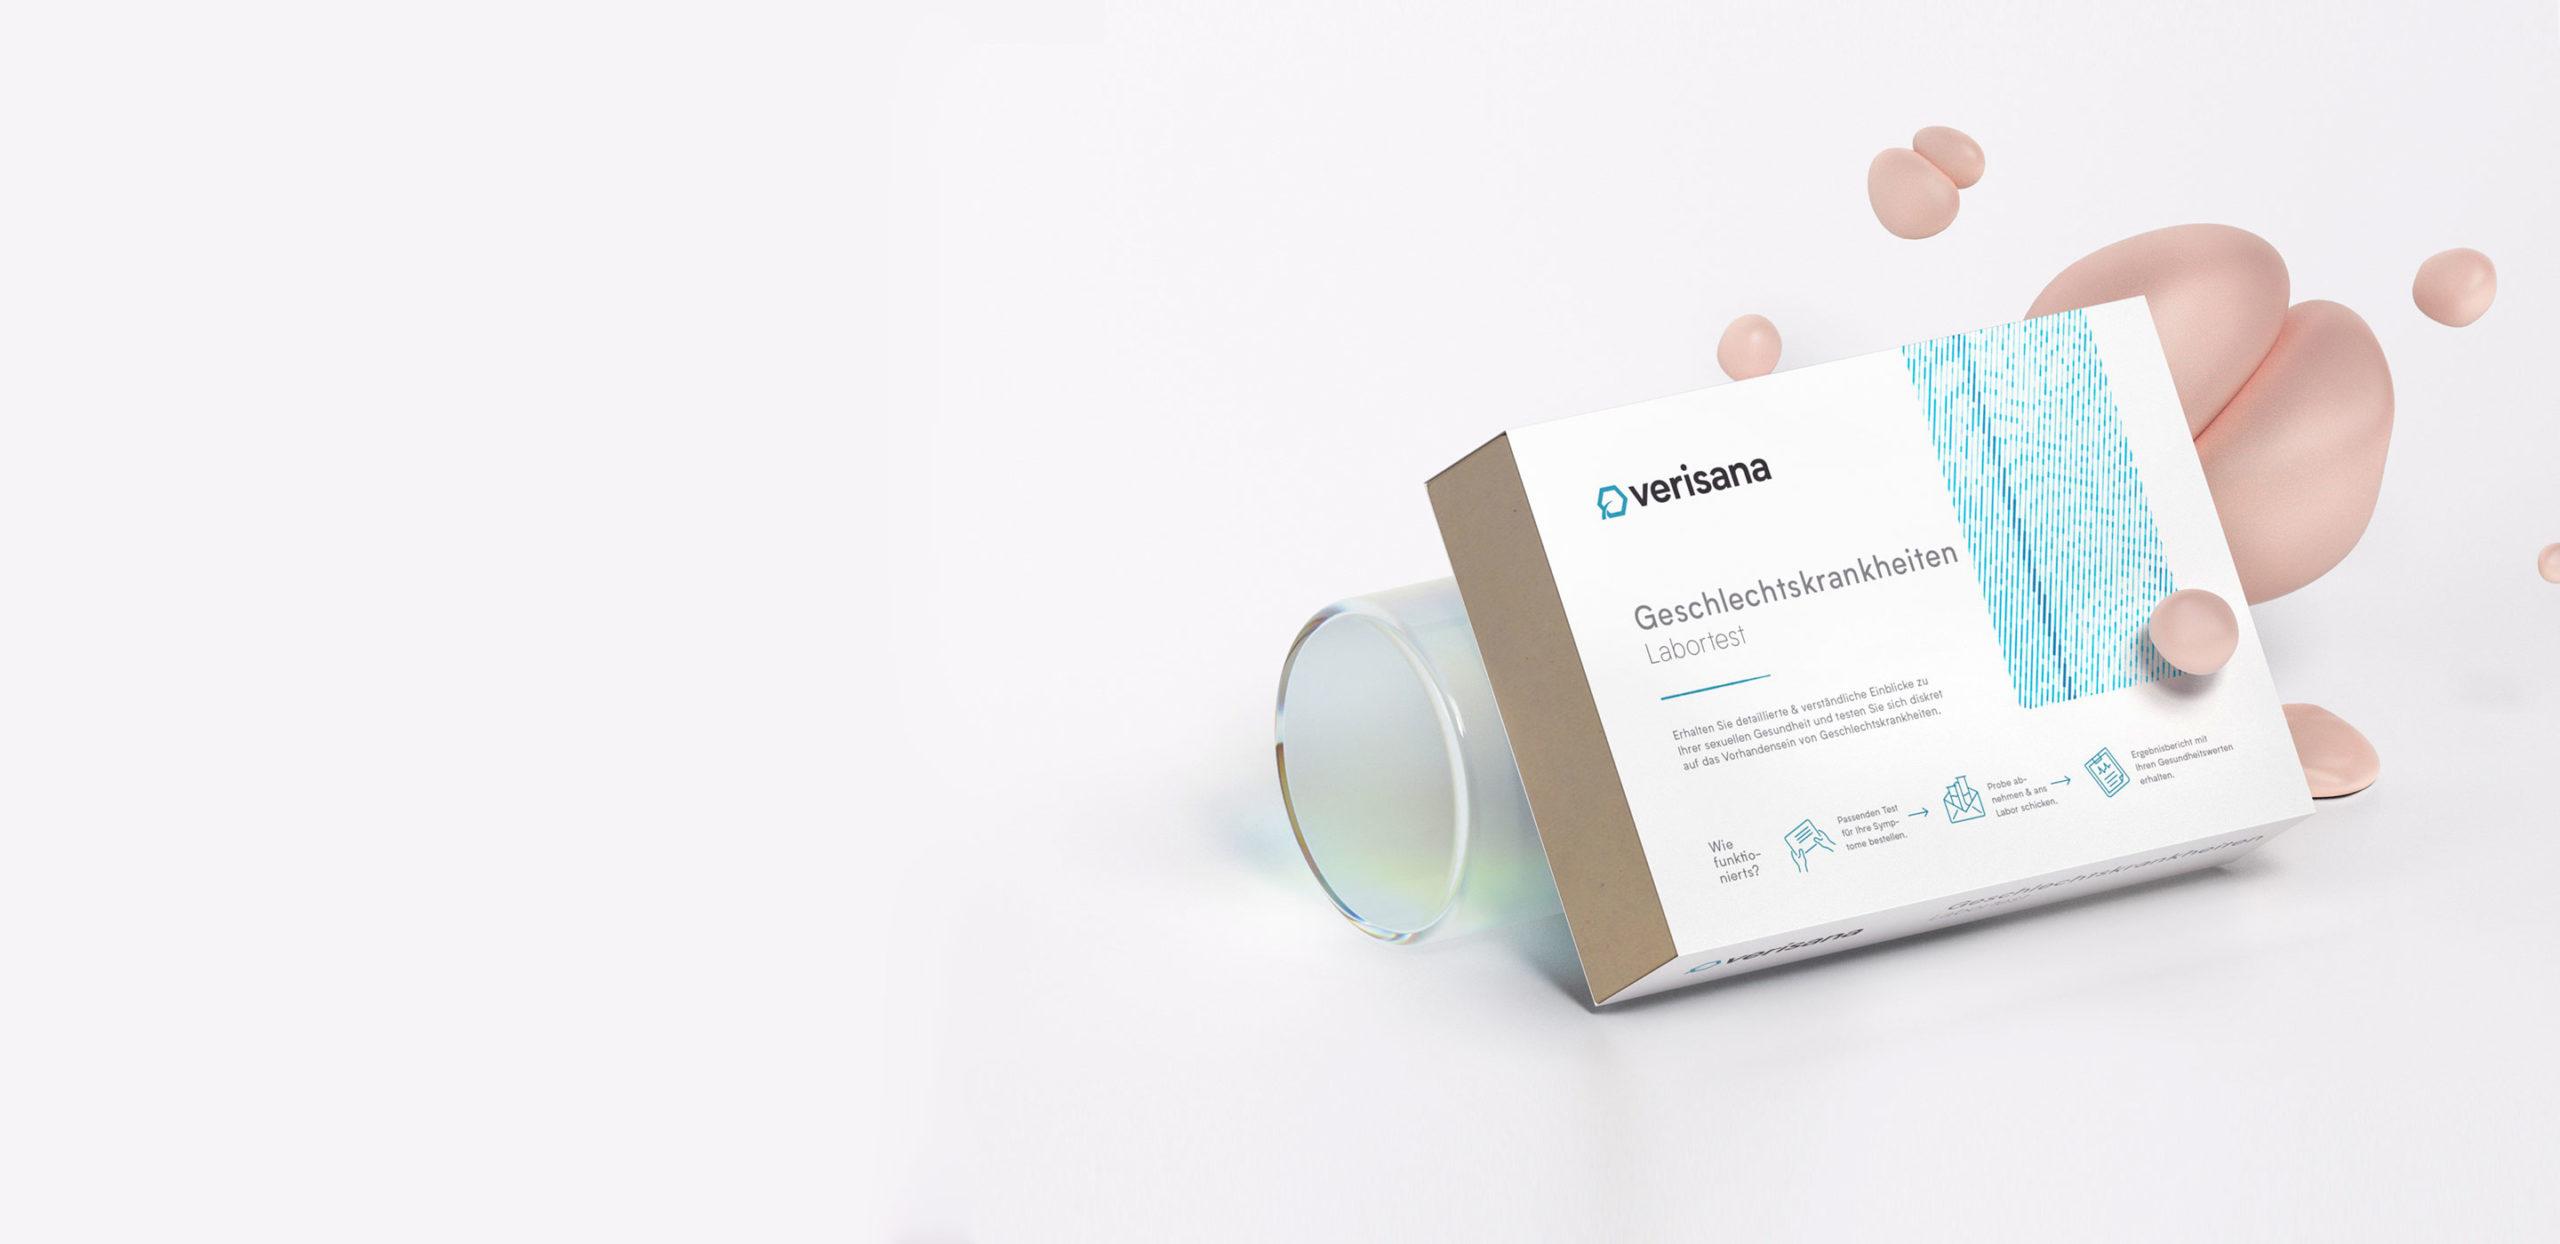 Verisana Geschlechtskrankheiten-Tests – D